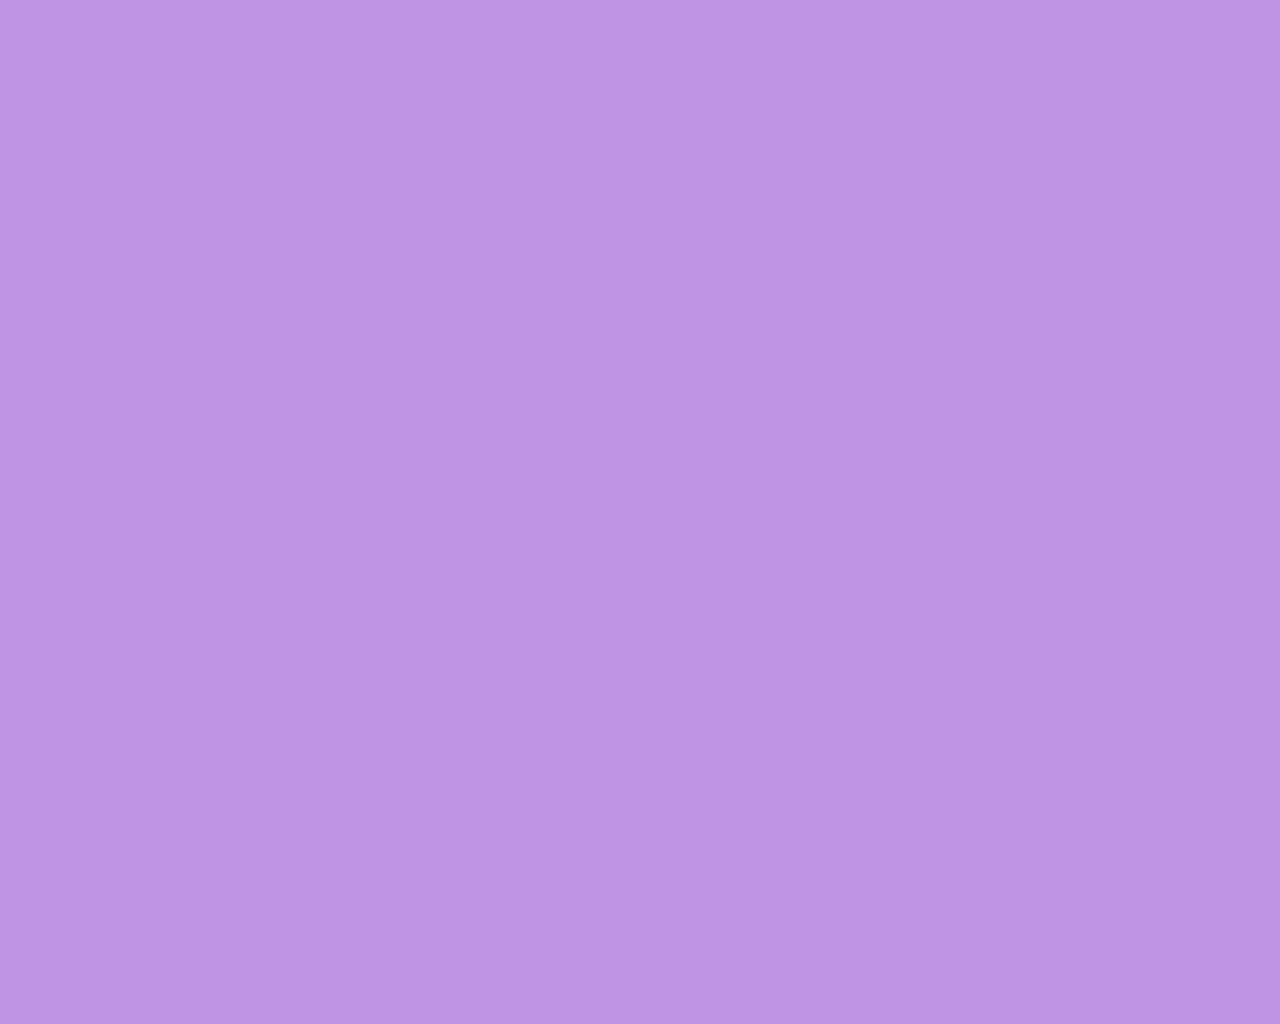 Solid Lavender Color Wallpaper Solid bright purple pin light 1280x1024